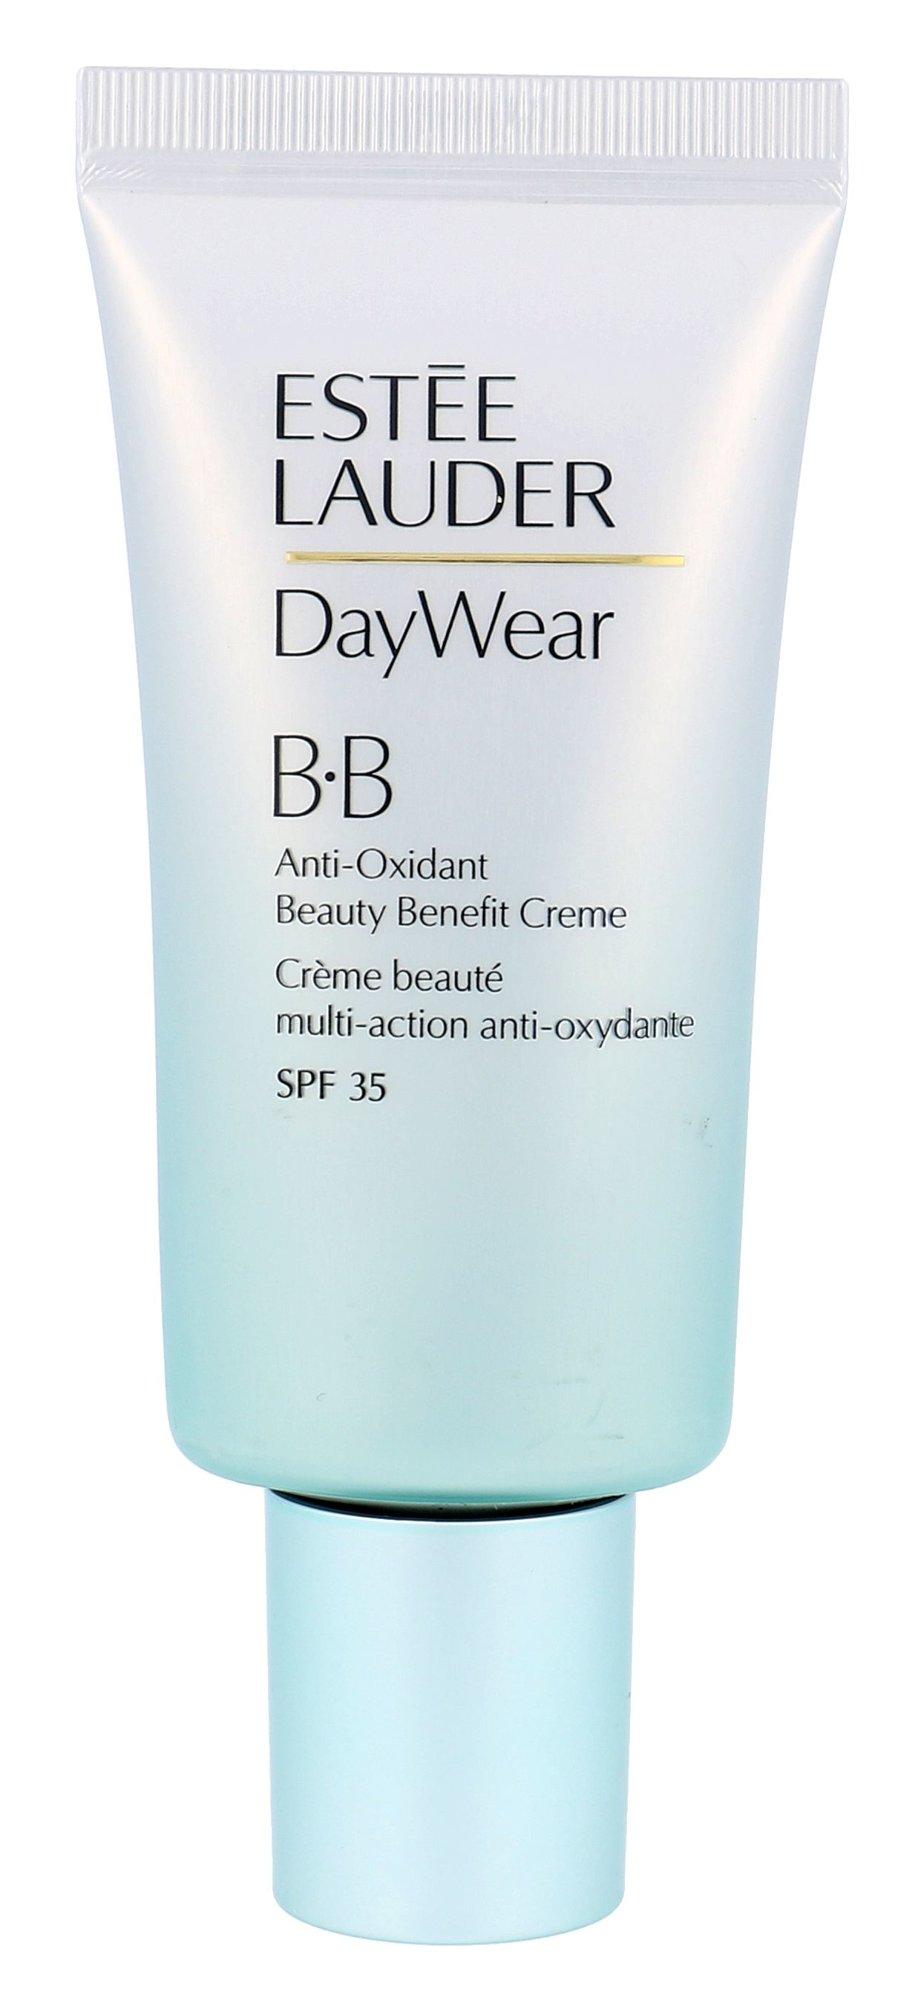 Estée Lauder DayWear Cosmetic 30ml 1,5 Light/Medium